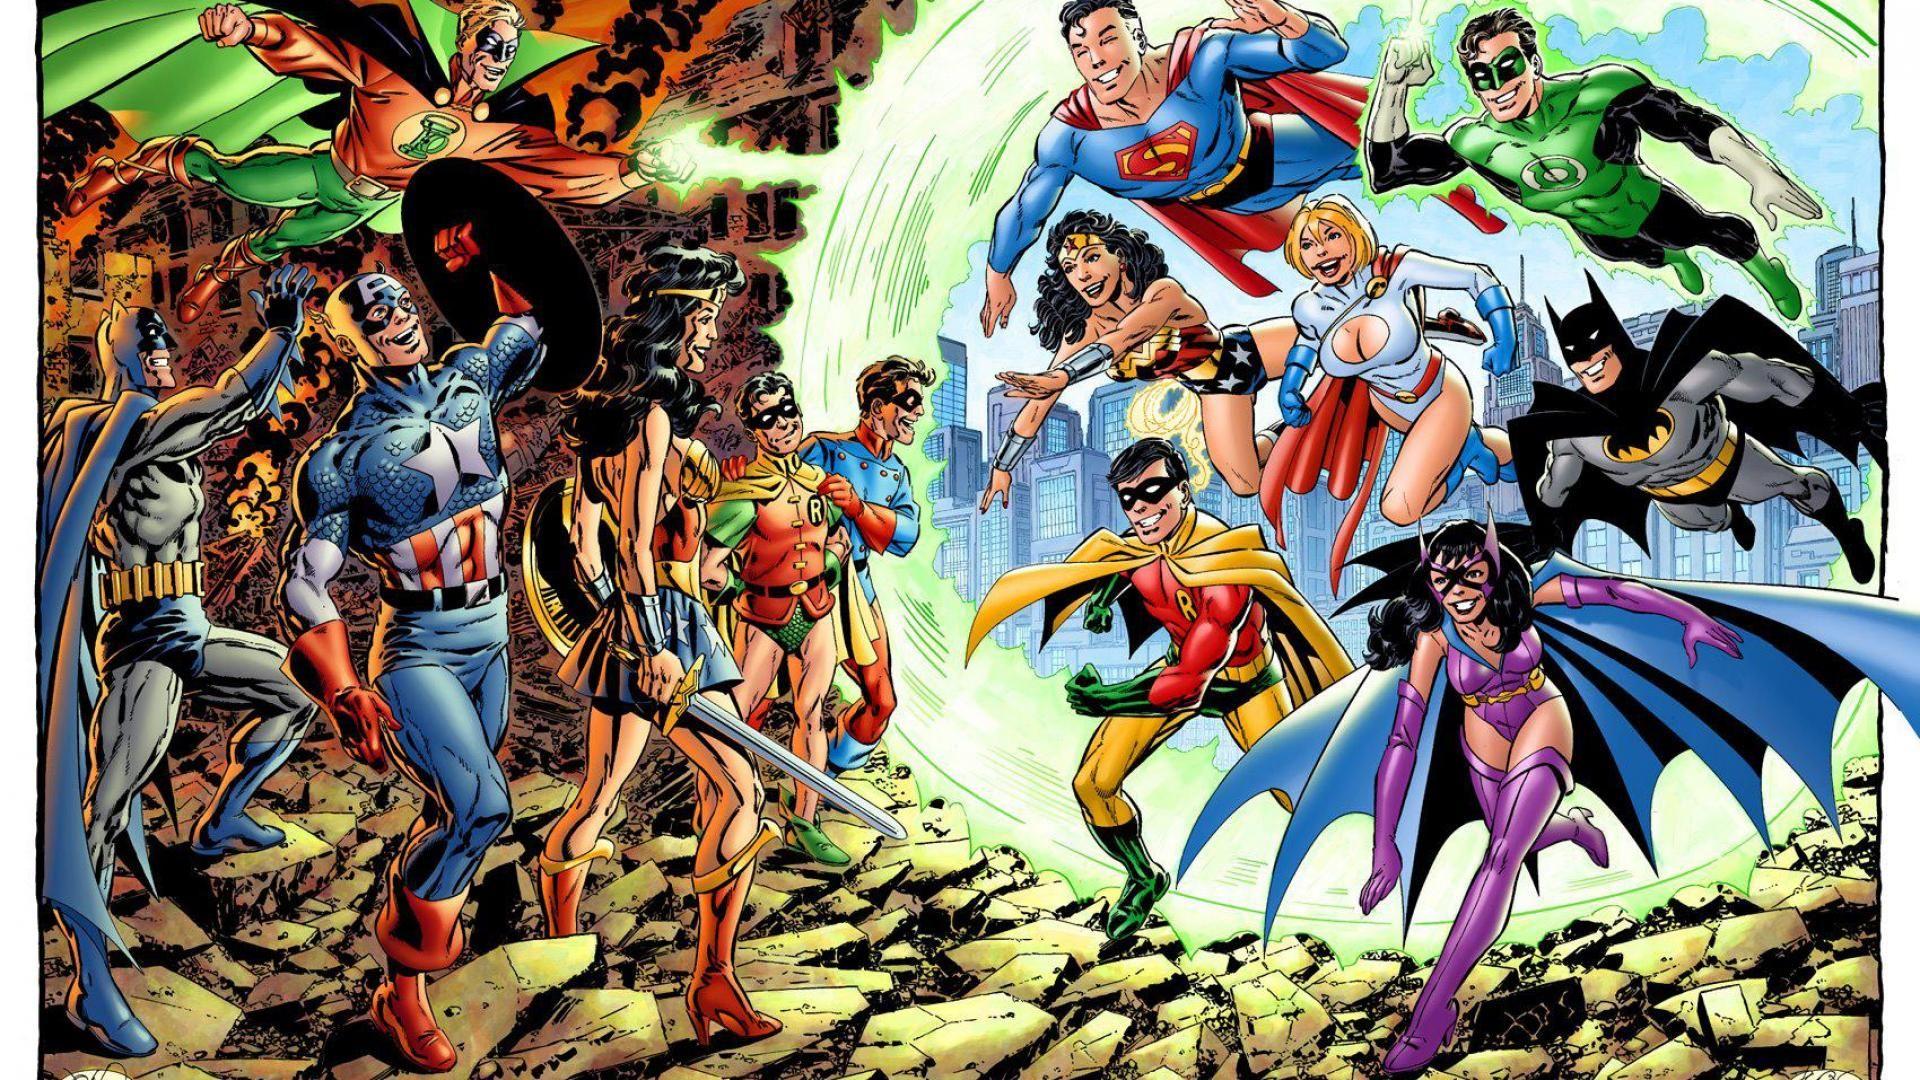 Marvel Vs DC Wallpapers Wallpaper